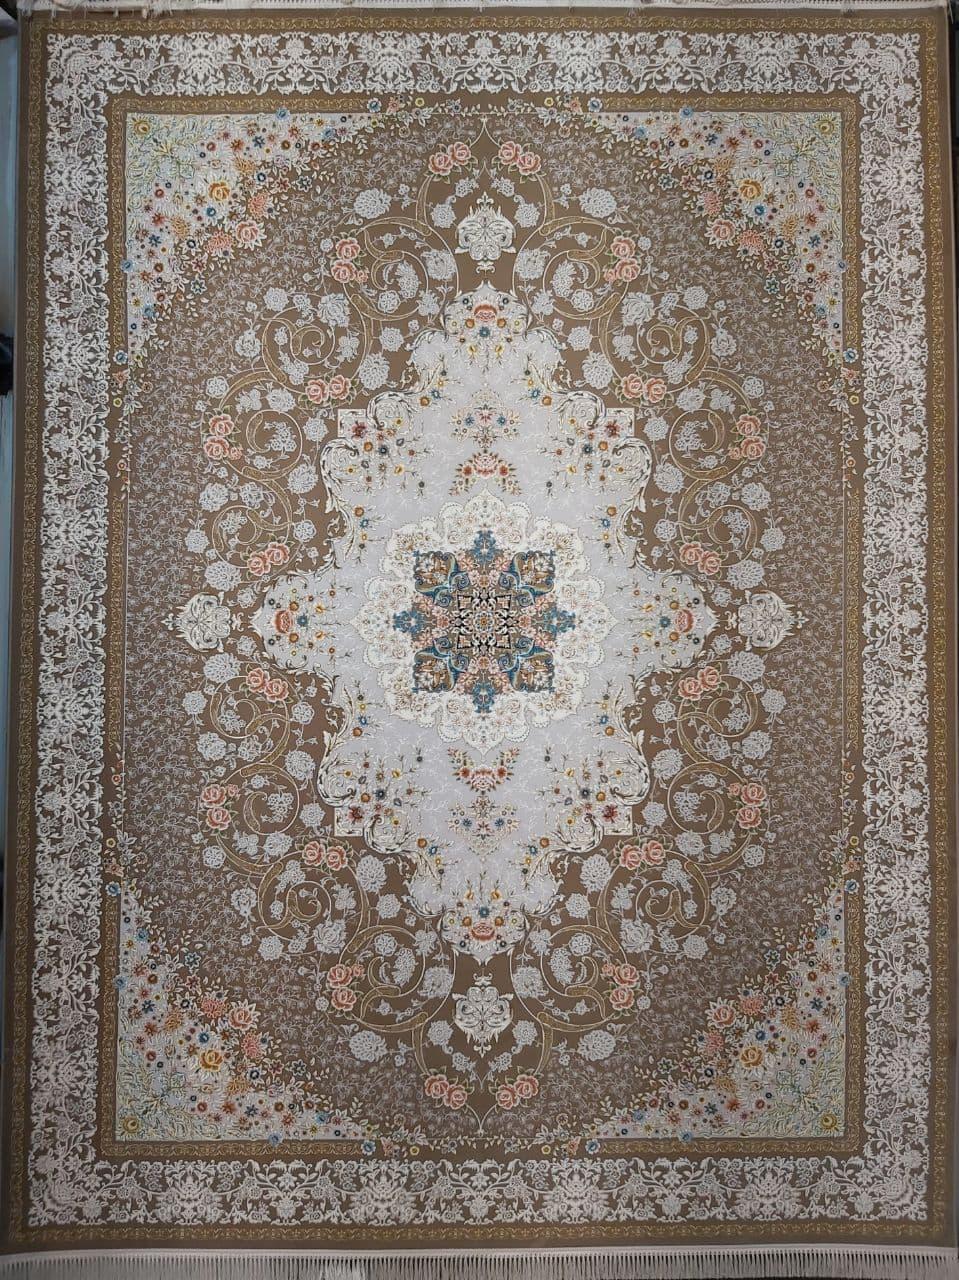 فرش 1200 شانه گل برجسته نقشه ناوک زمینه نسکافه ای